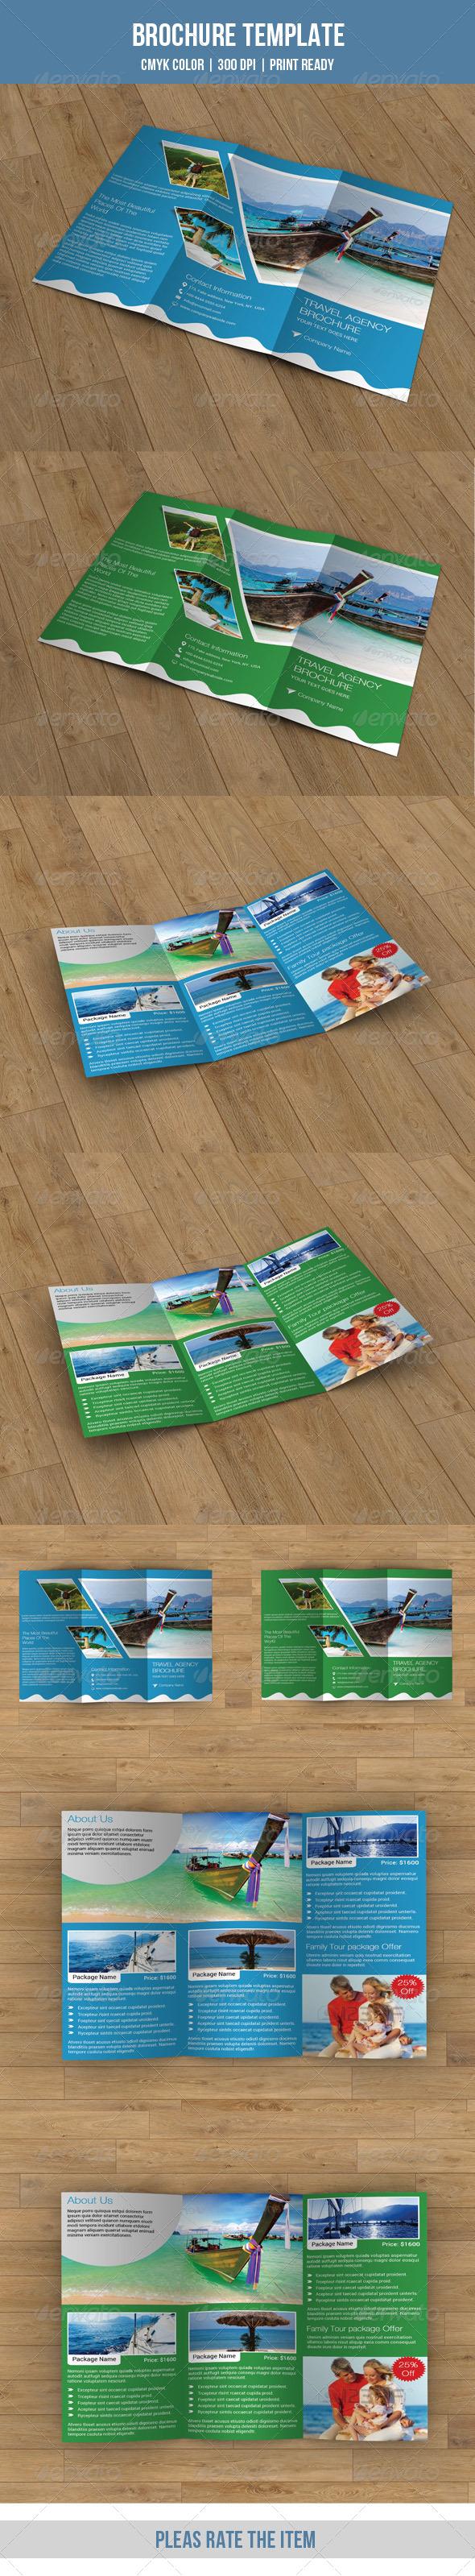 GraphicRiver Tri-fold business brochure v51 8579618